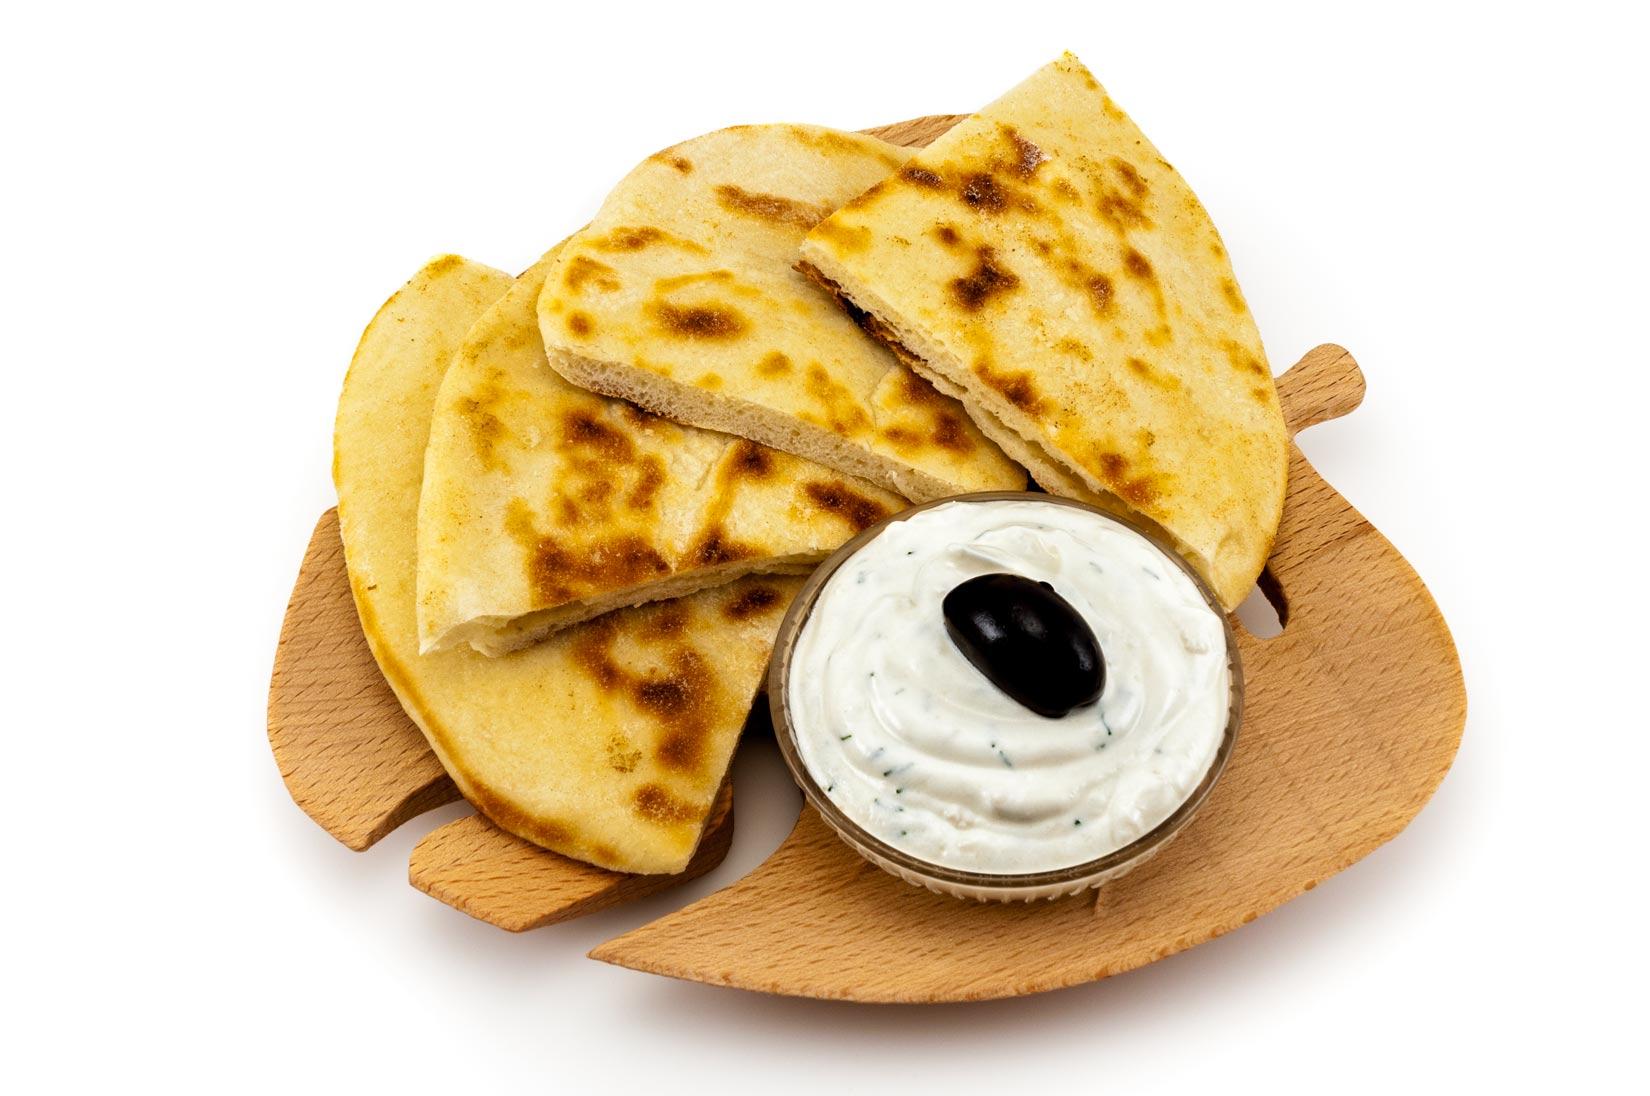 Pita chléb a ochucený jogurtový dip - skvělá svačinka